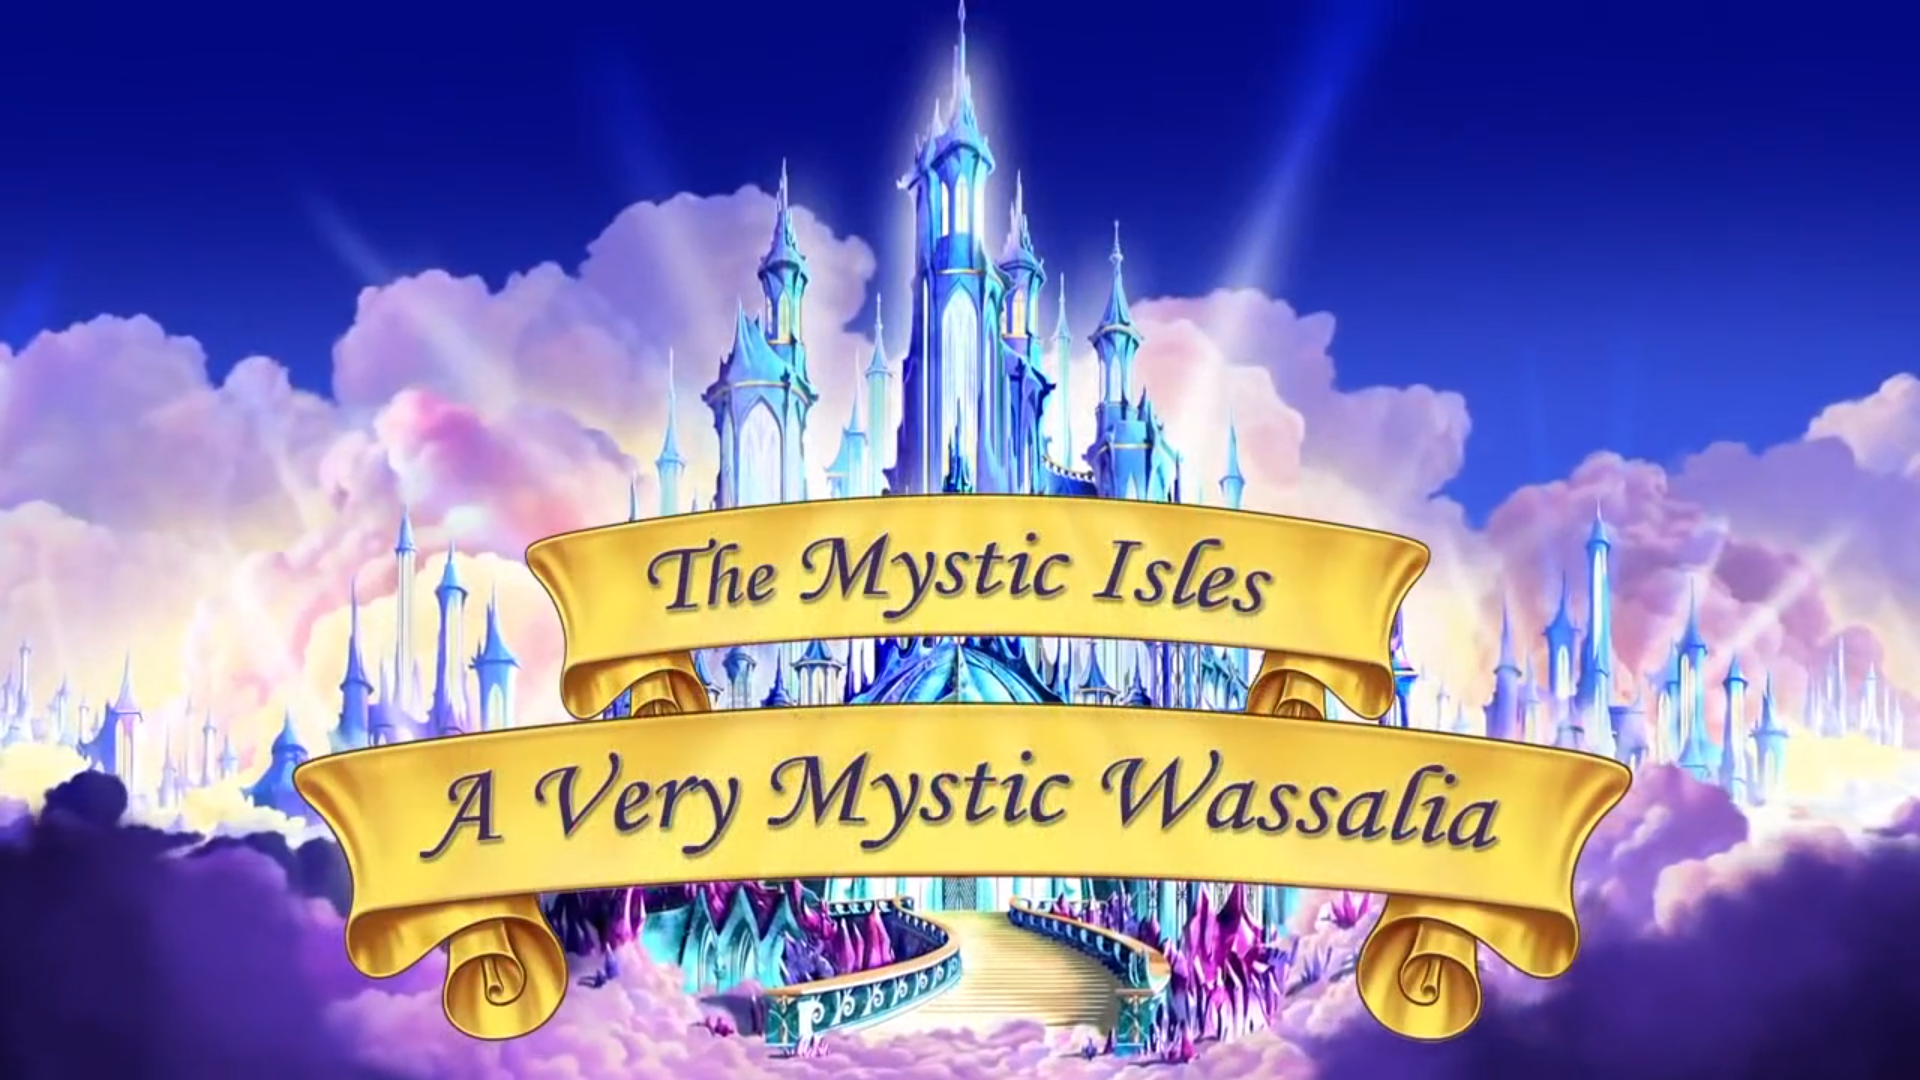 The Mystic Isles: A Very Mystic Wassailia